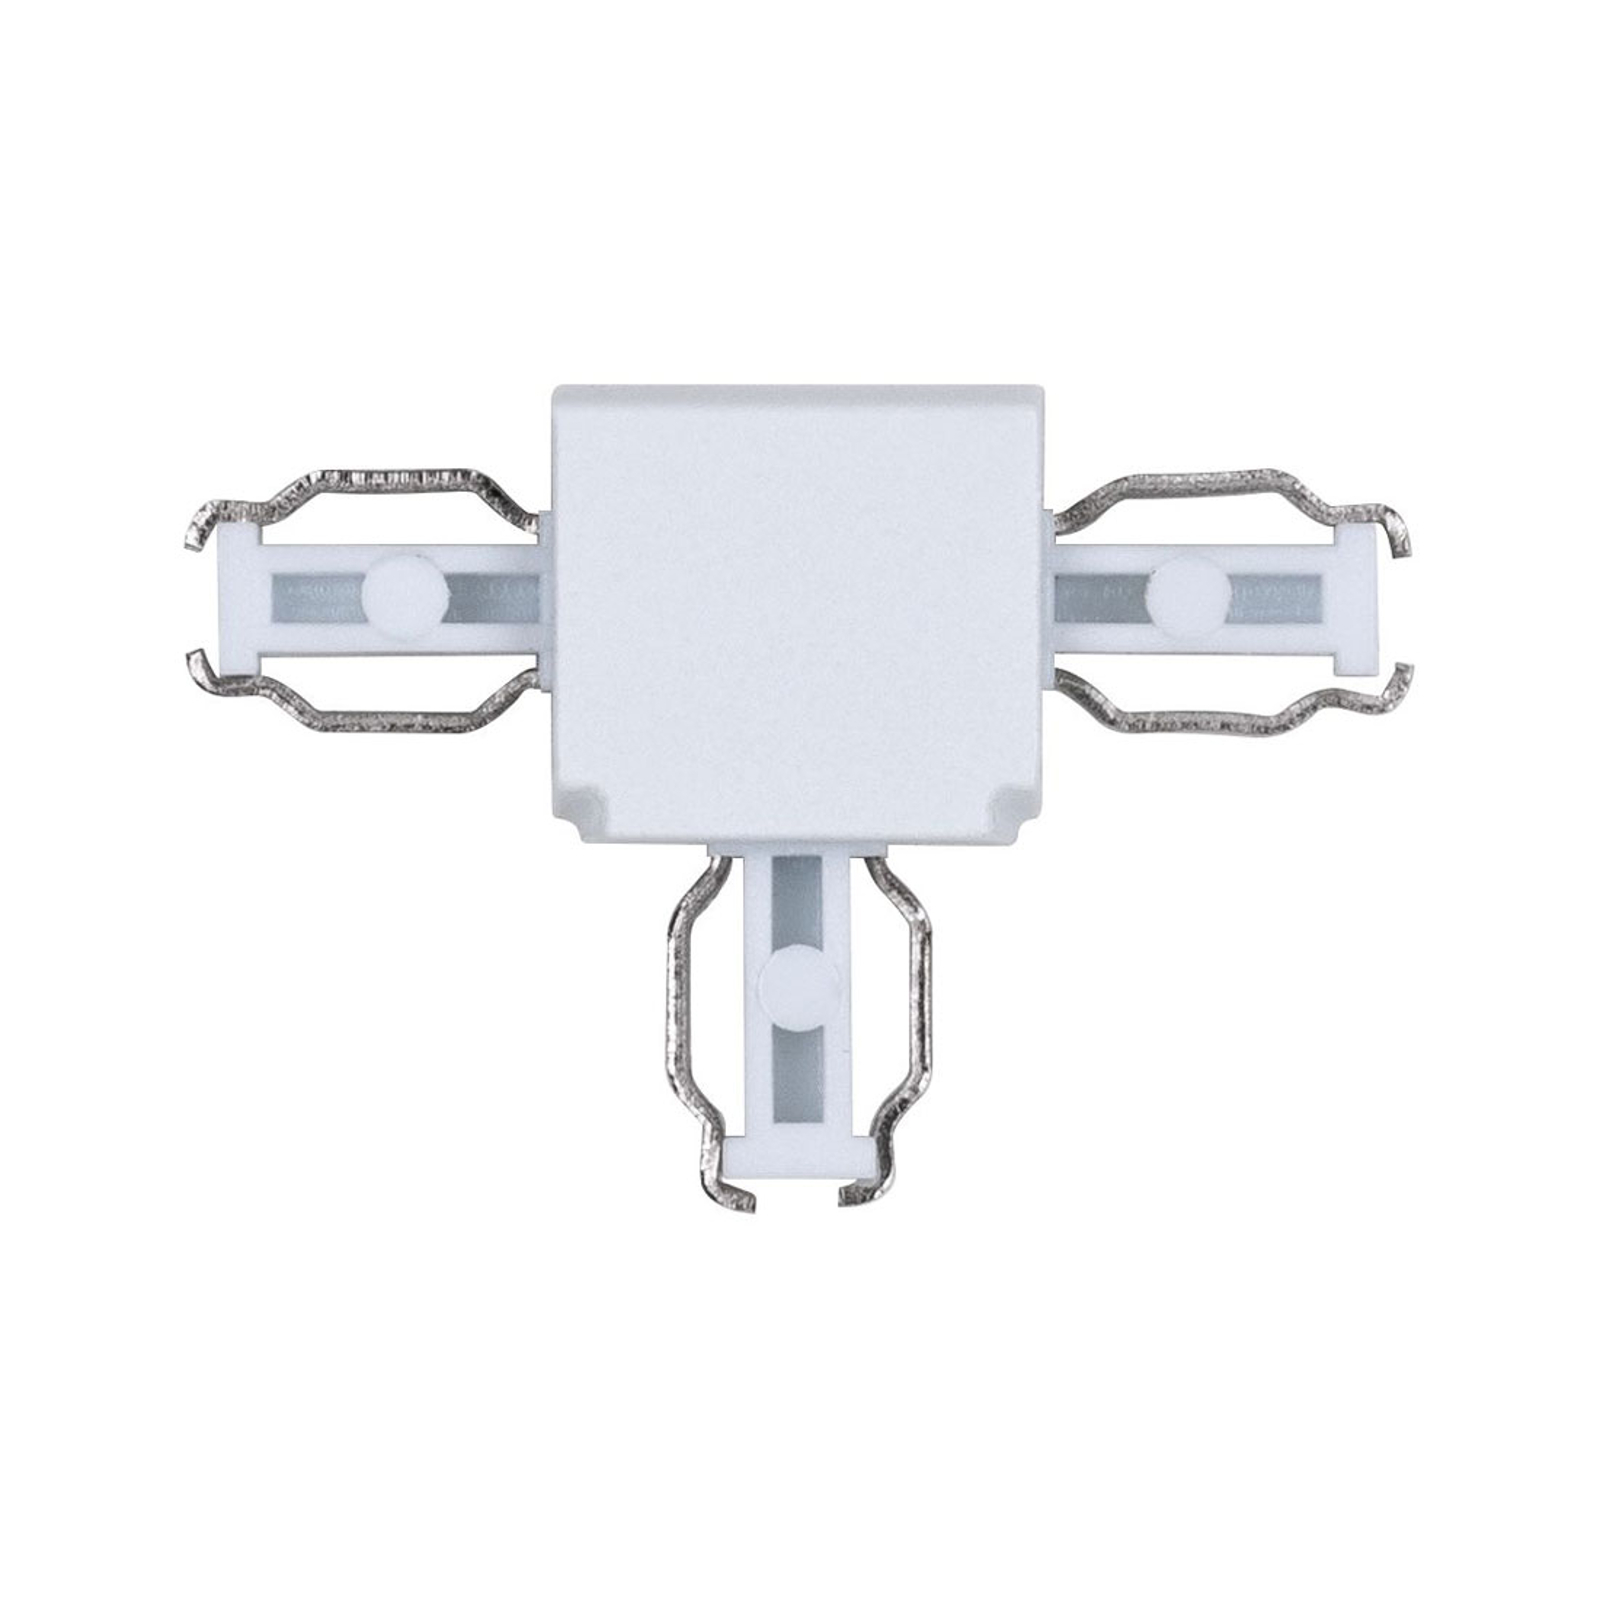 Paulmann NanoRail T-Verbinder, weiß